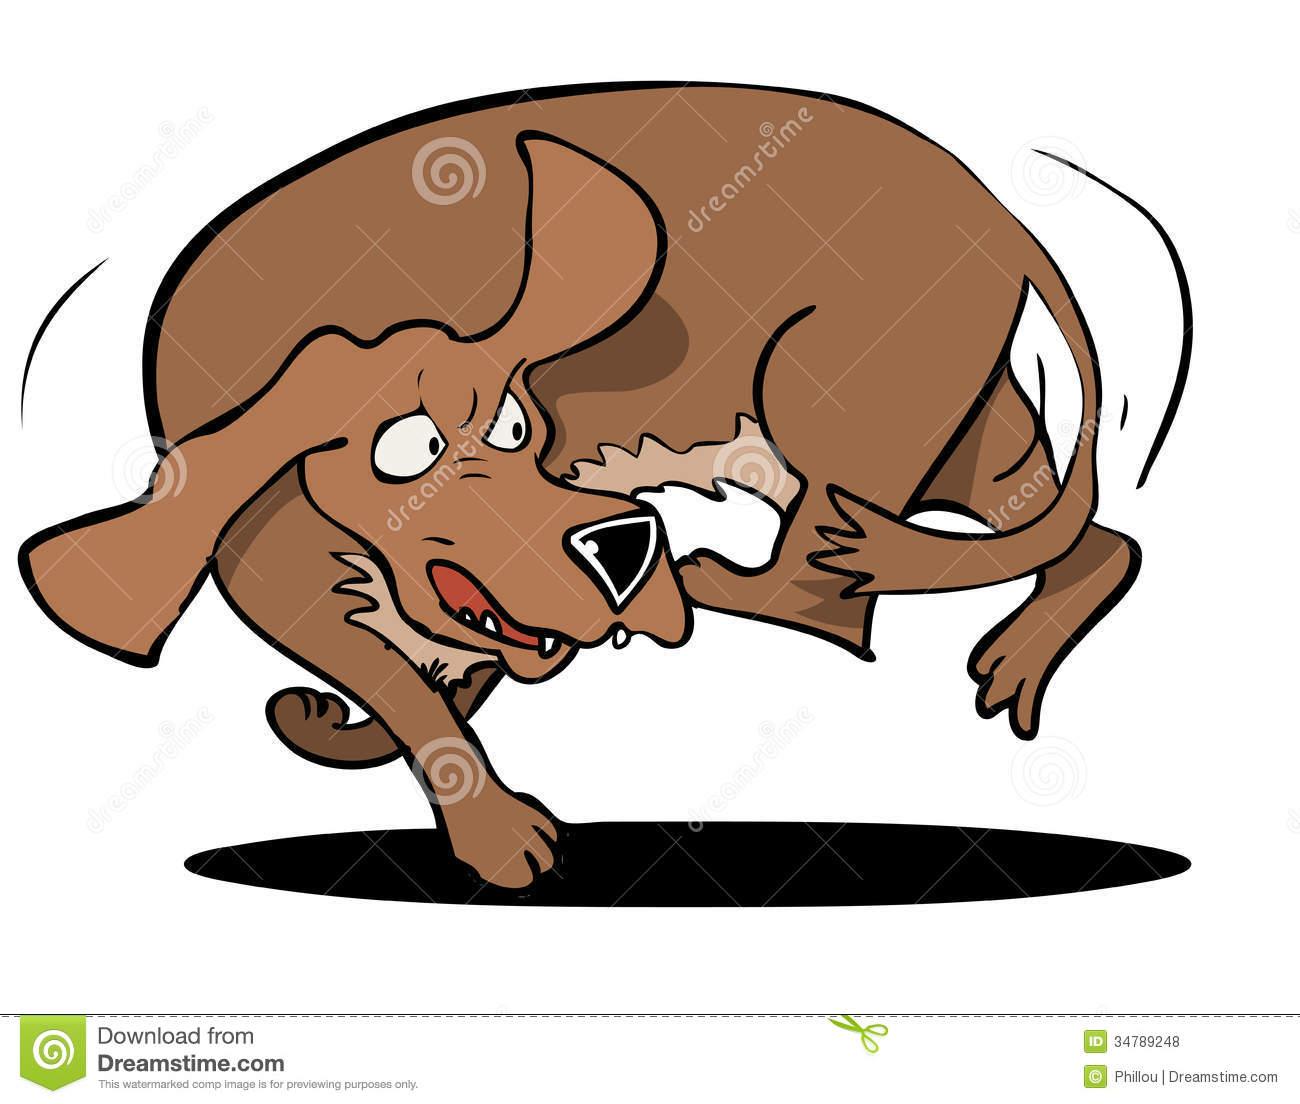 Dog biting tail clipart image transparent download Dog chasing tail clipart - ClipartFest image transparent download